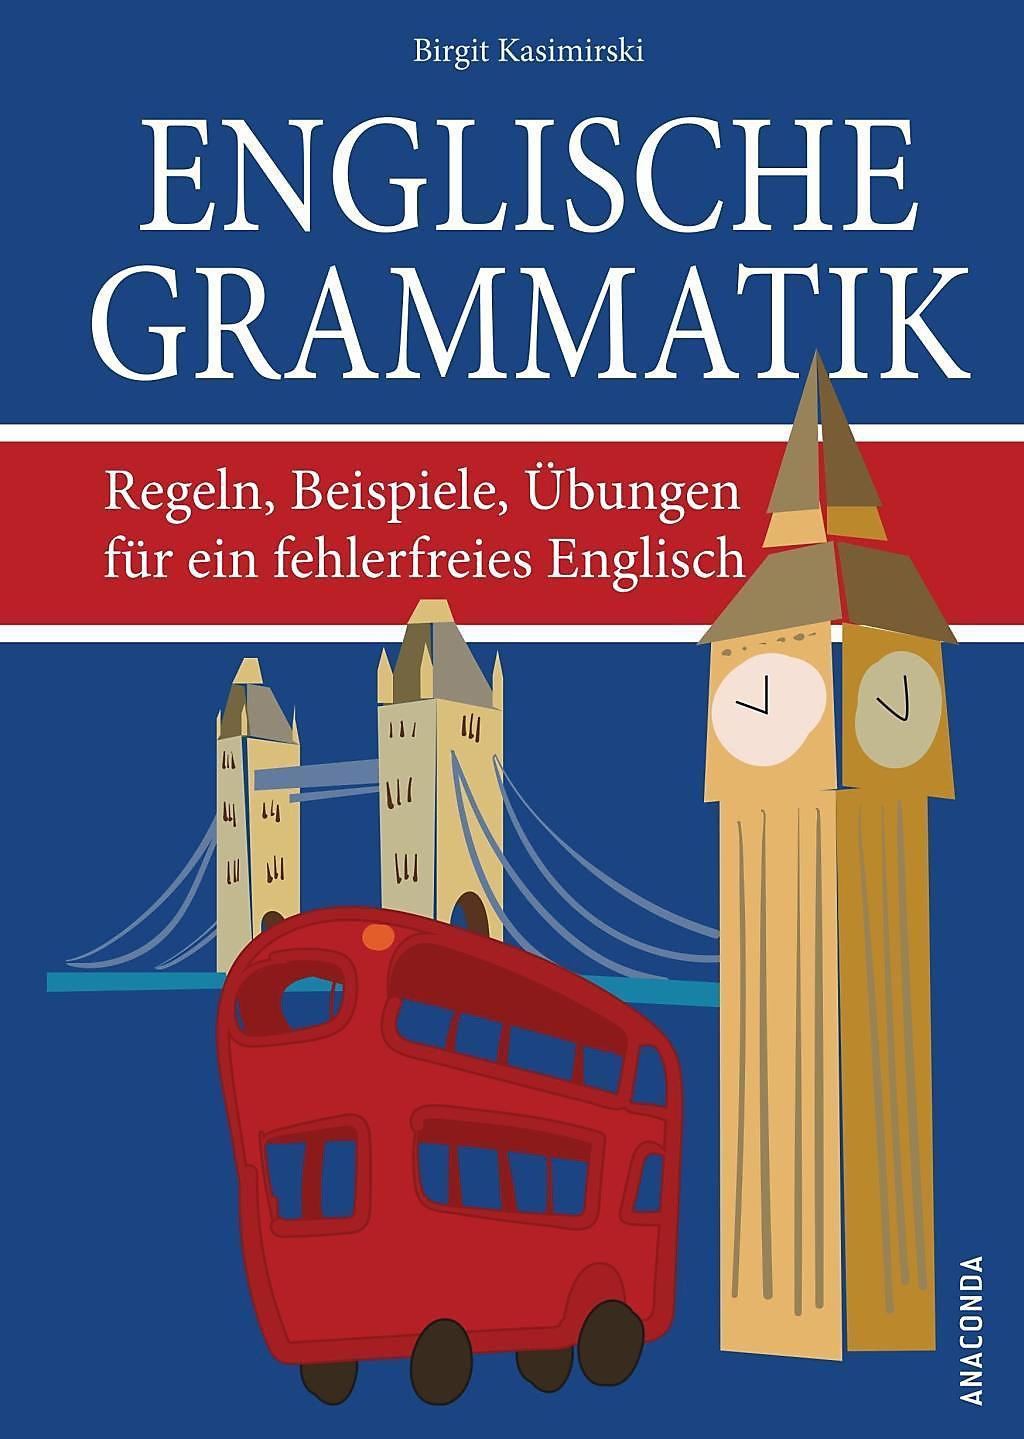 Englische Grammatik Buch jetzt bei Weltbild.de online ...